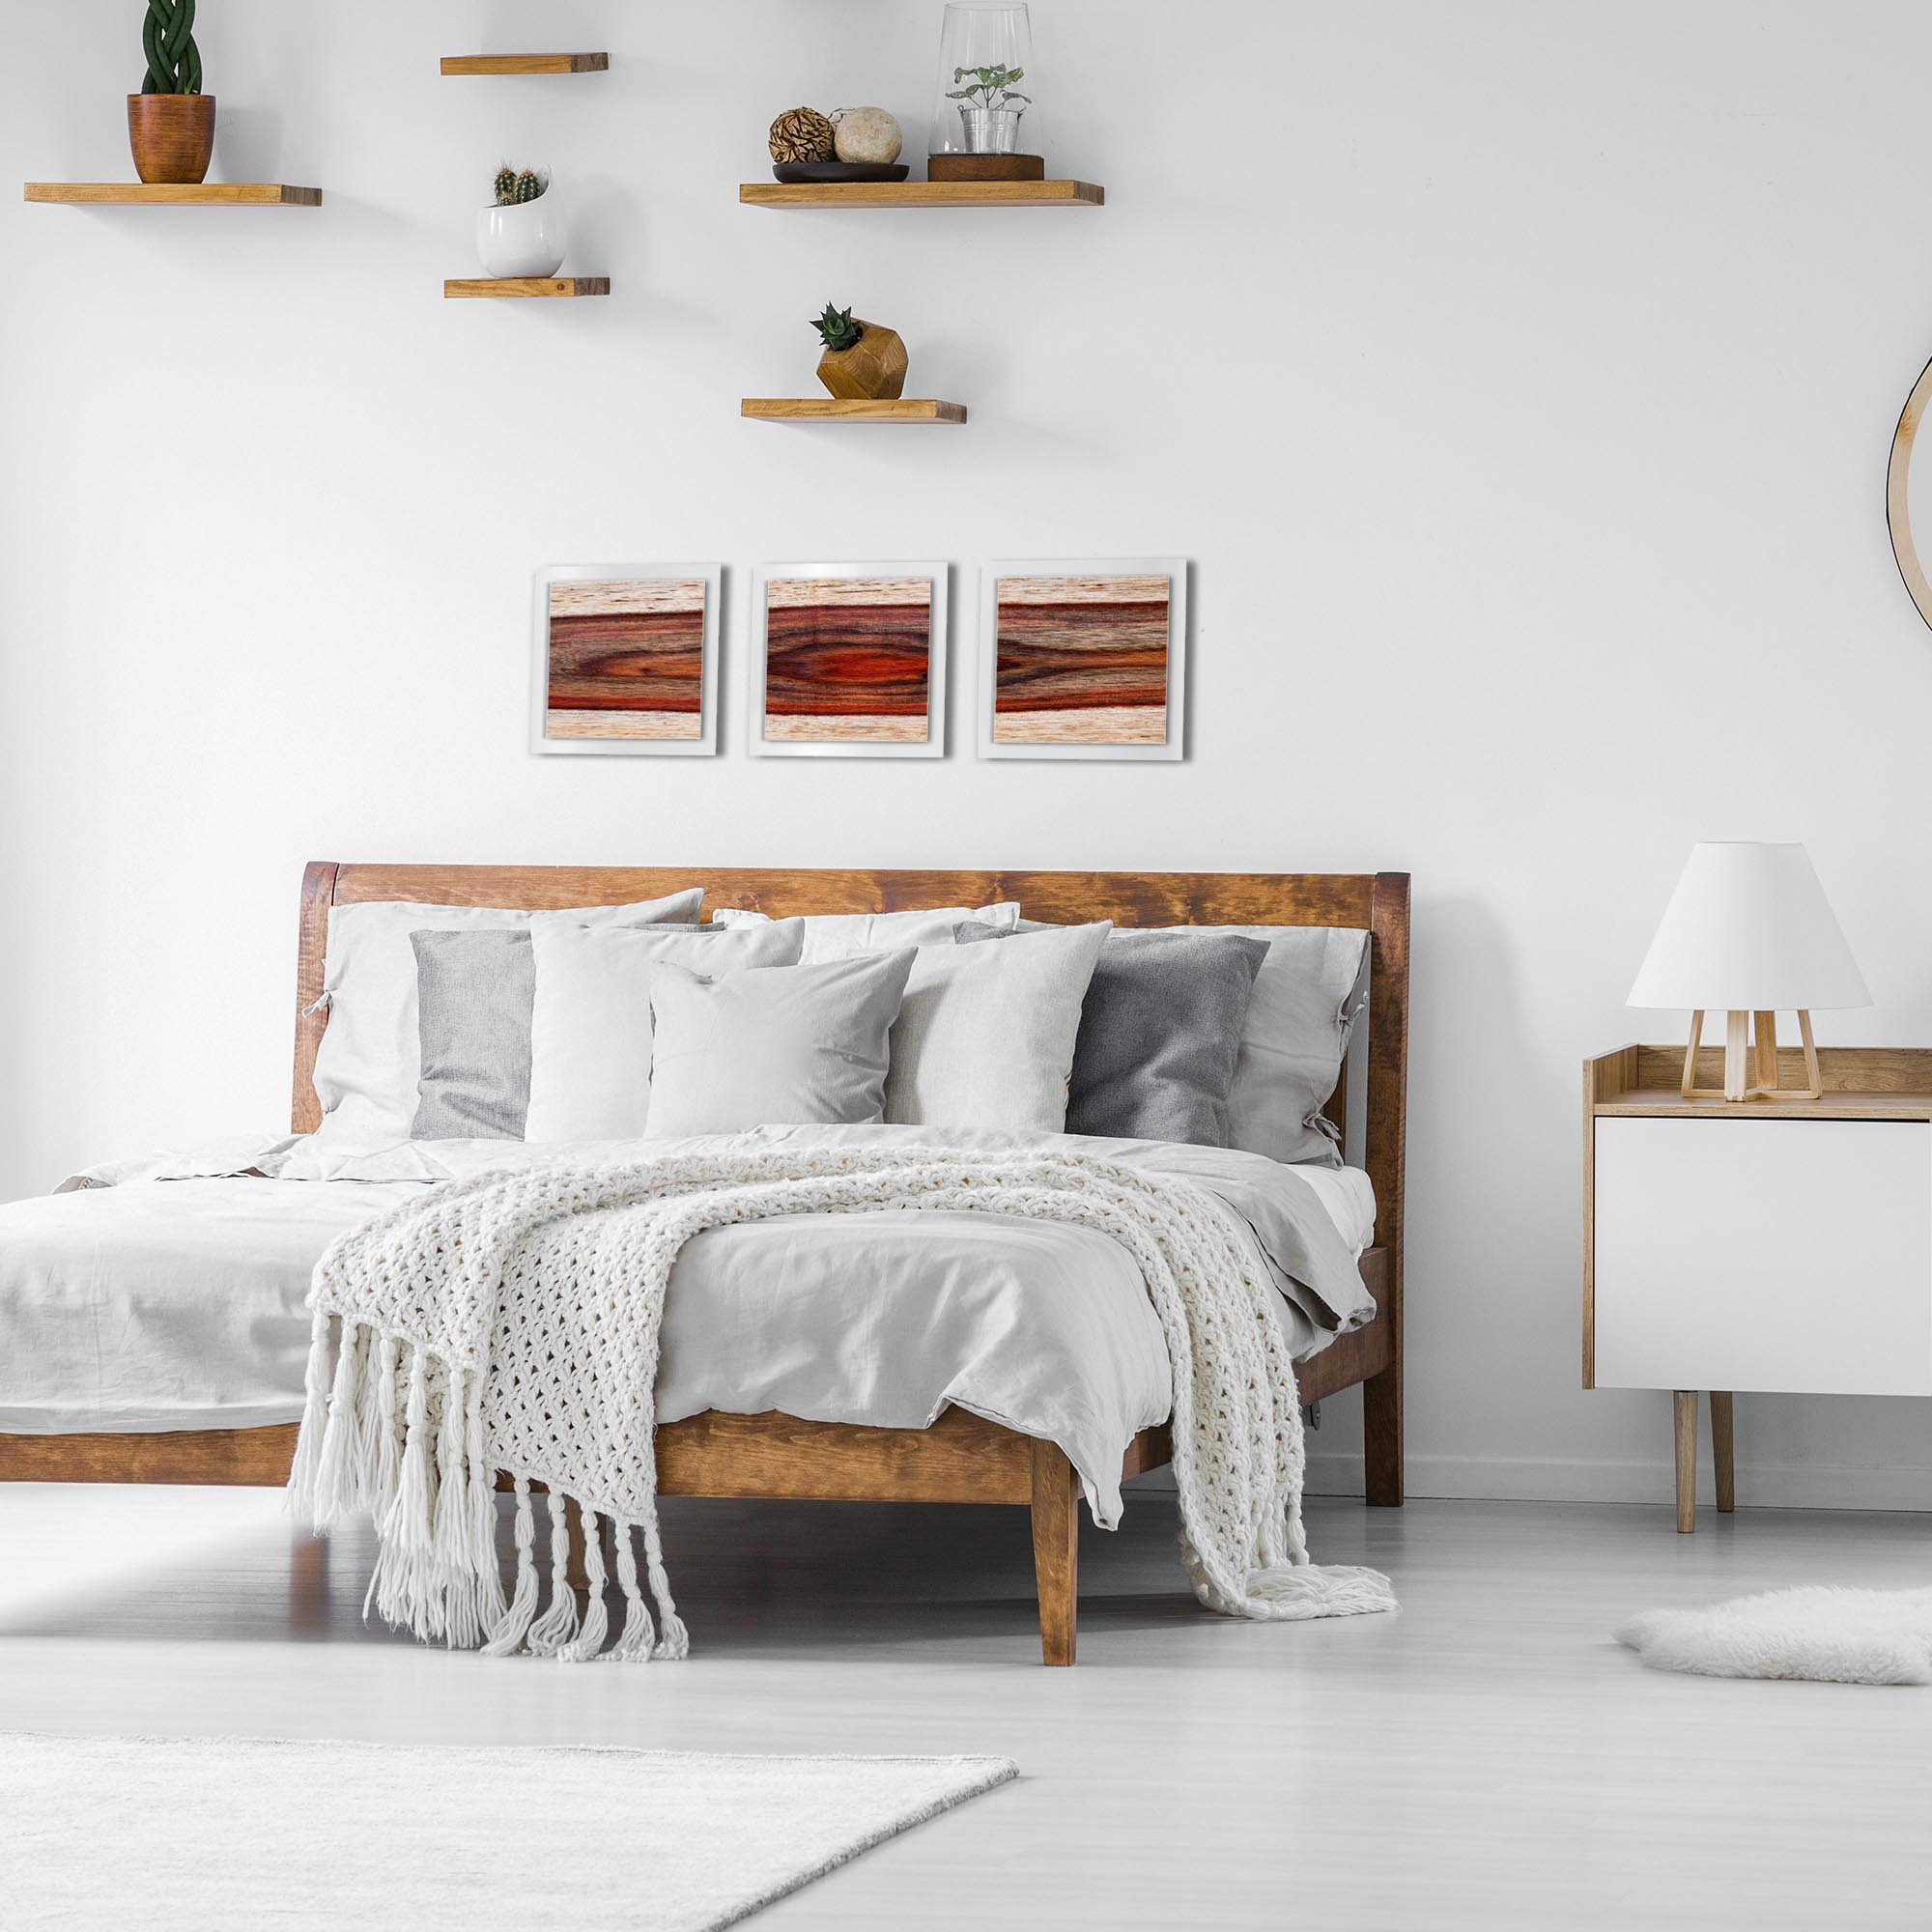 Auburn Wood Essence White by Adam Schwoeppe Rustic Modern Style Wood Wall Art - Lifestyle View